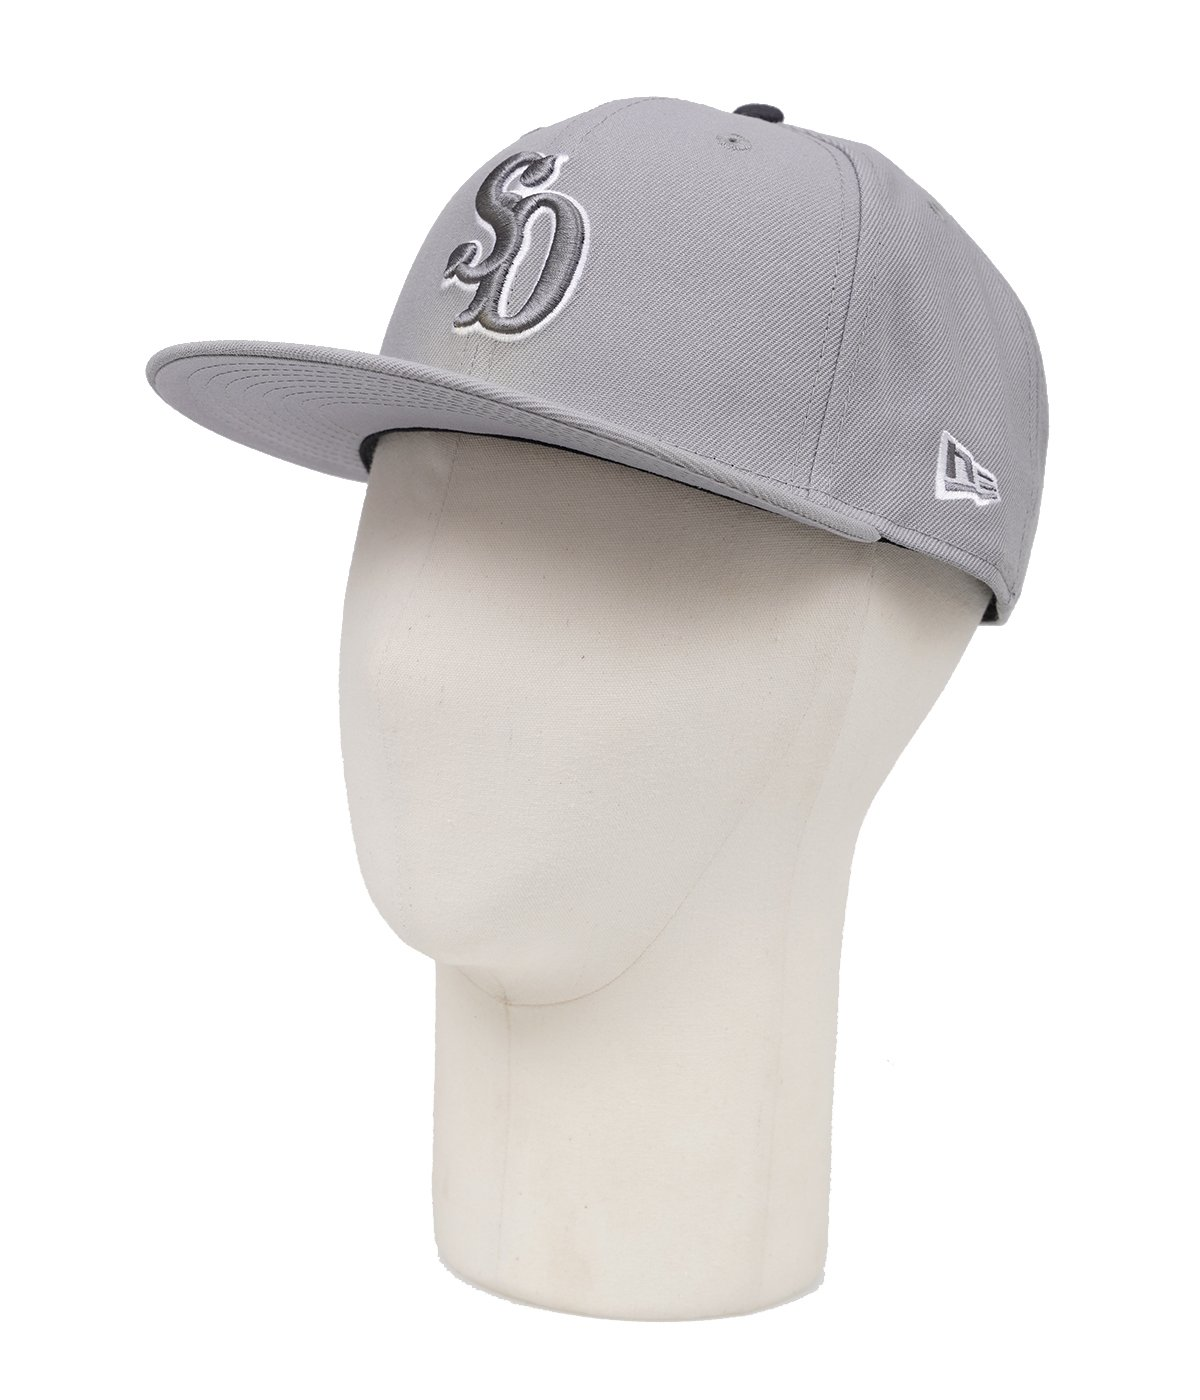 NEW ERA×SD 59FIFTY LOGO CAP